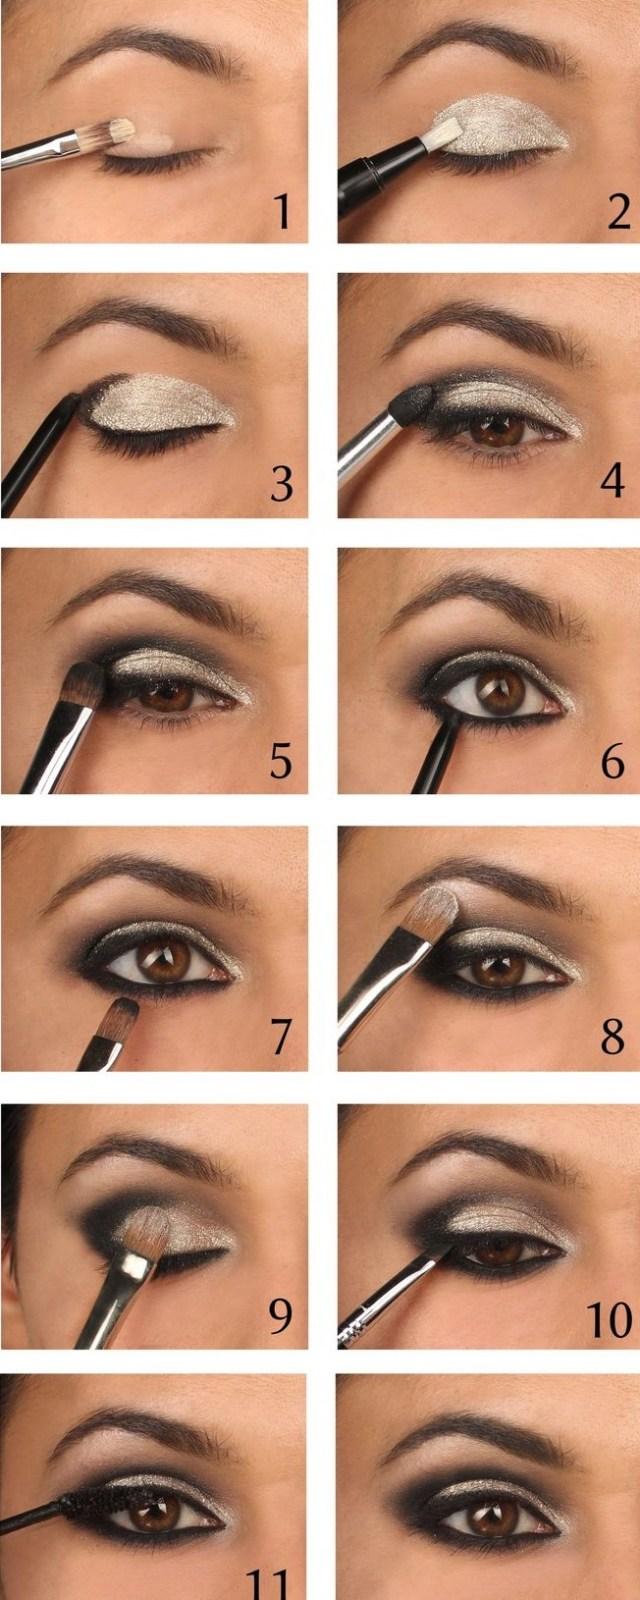 Makeup Tutorial For Hazel Eyes 40 Hottest Smokey Eye Makeup Ideas 2019 Smokey Eye Tutorials For